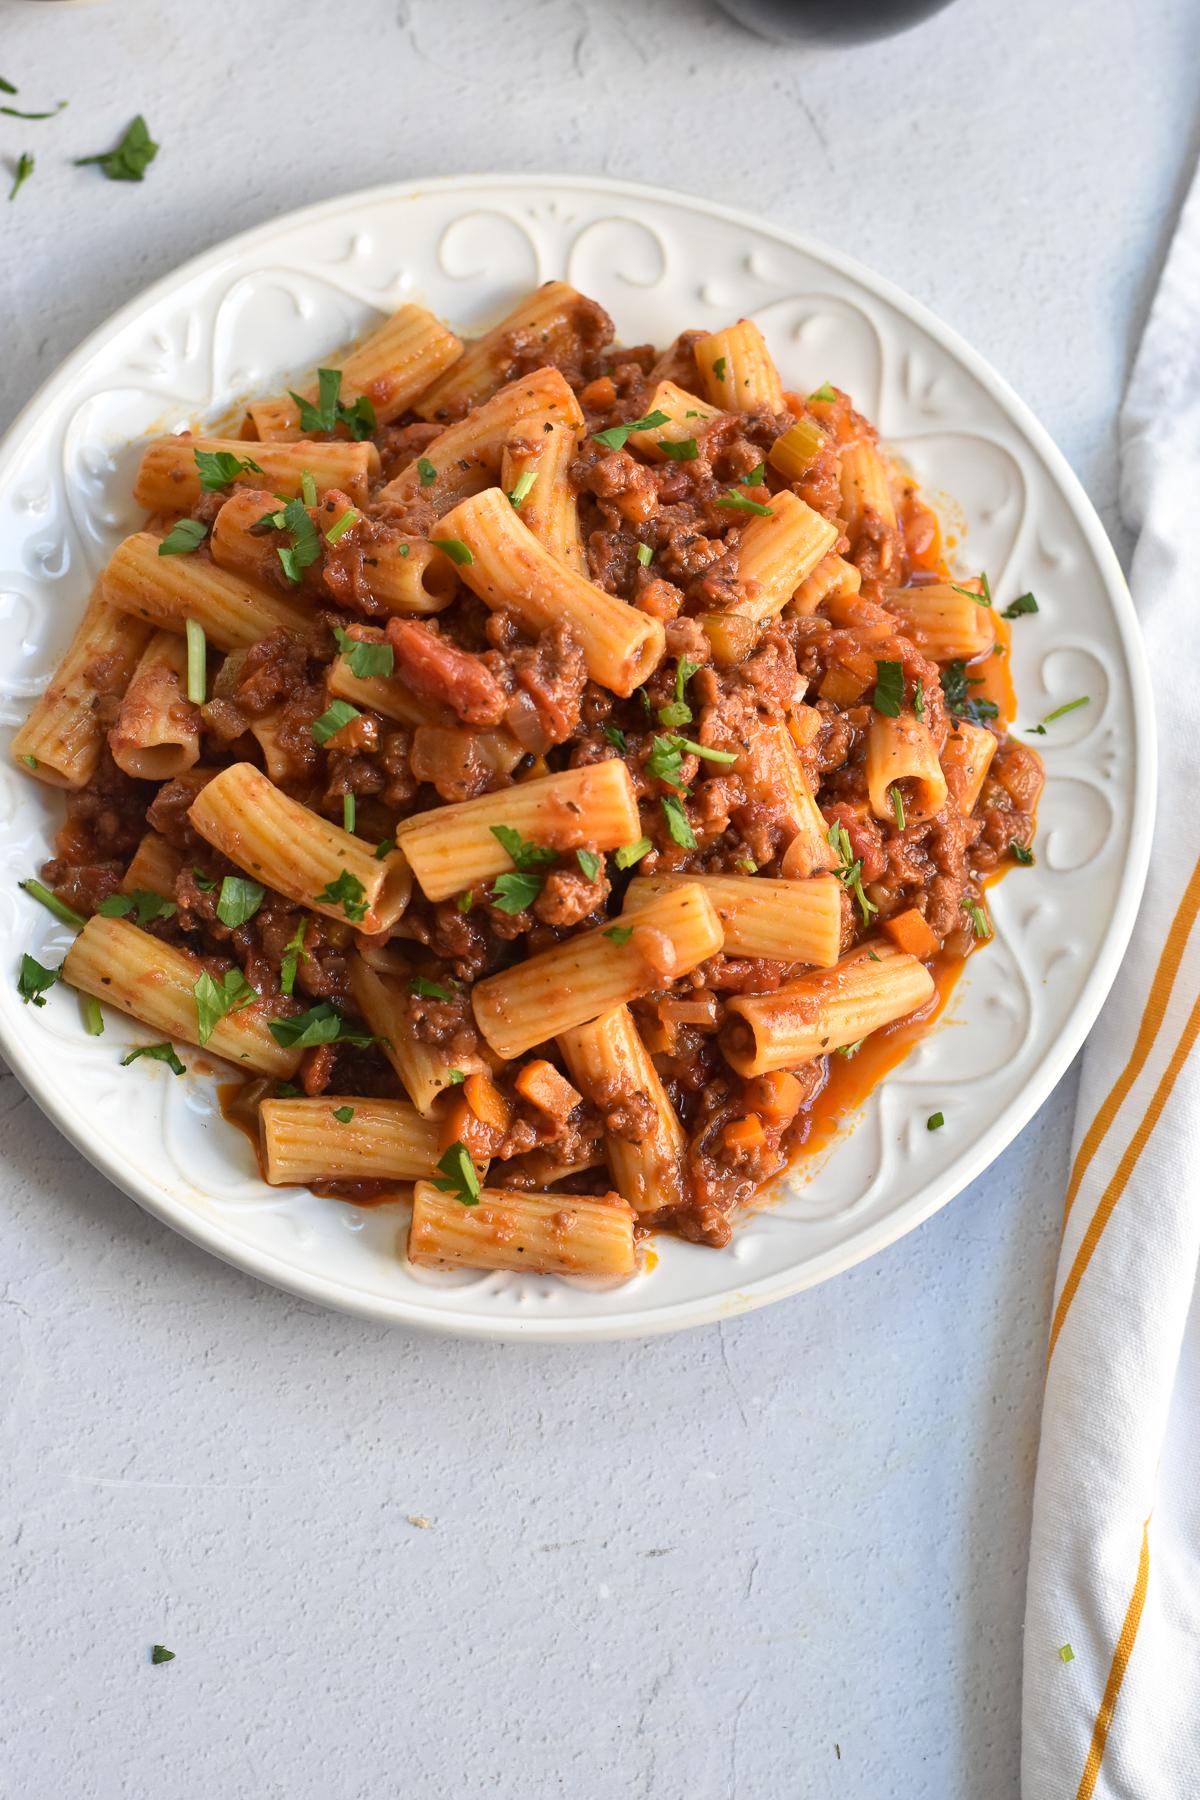 Spicy Vegan Sausage Pasta